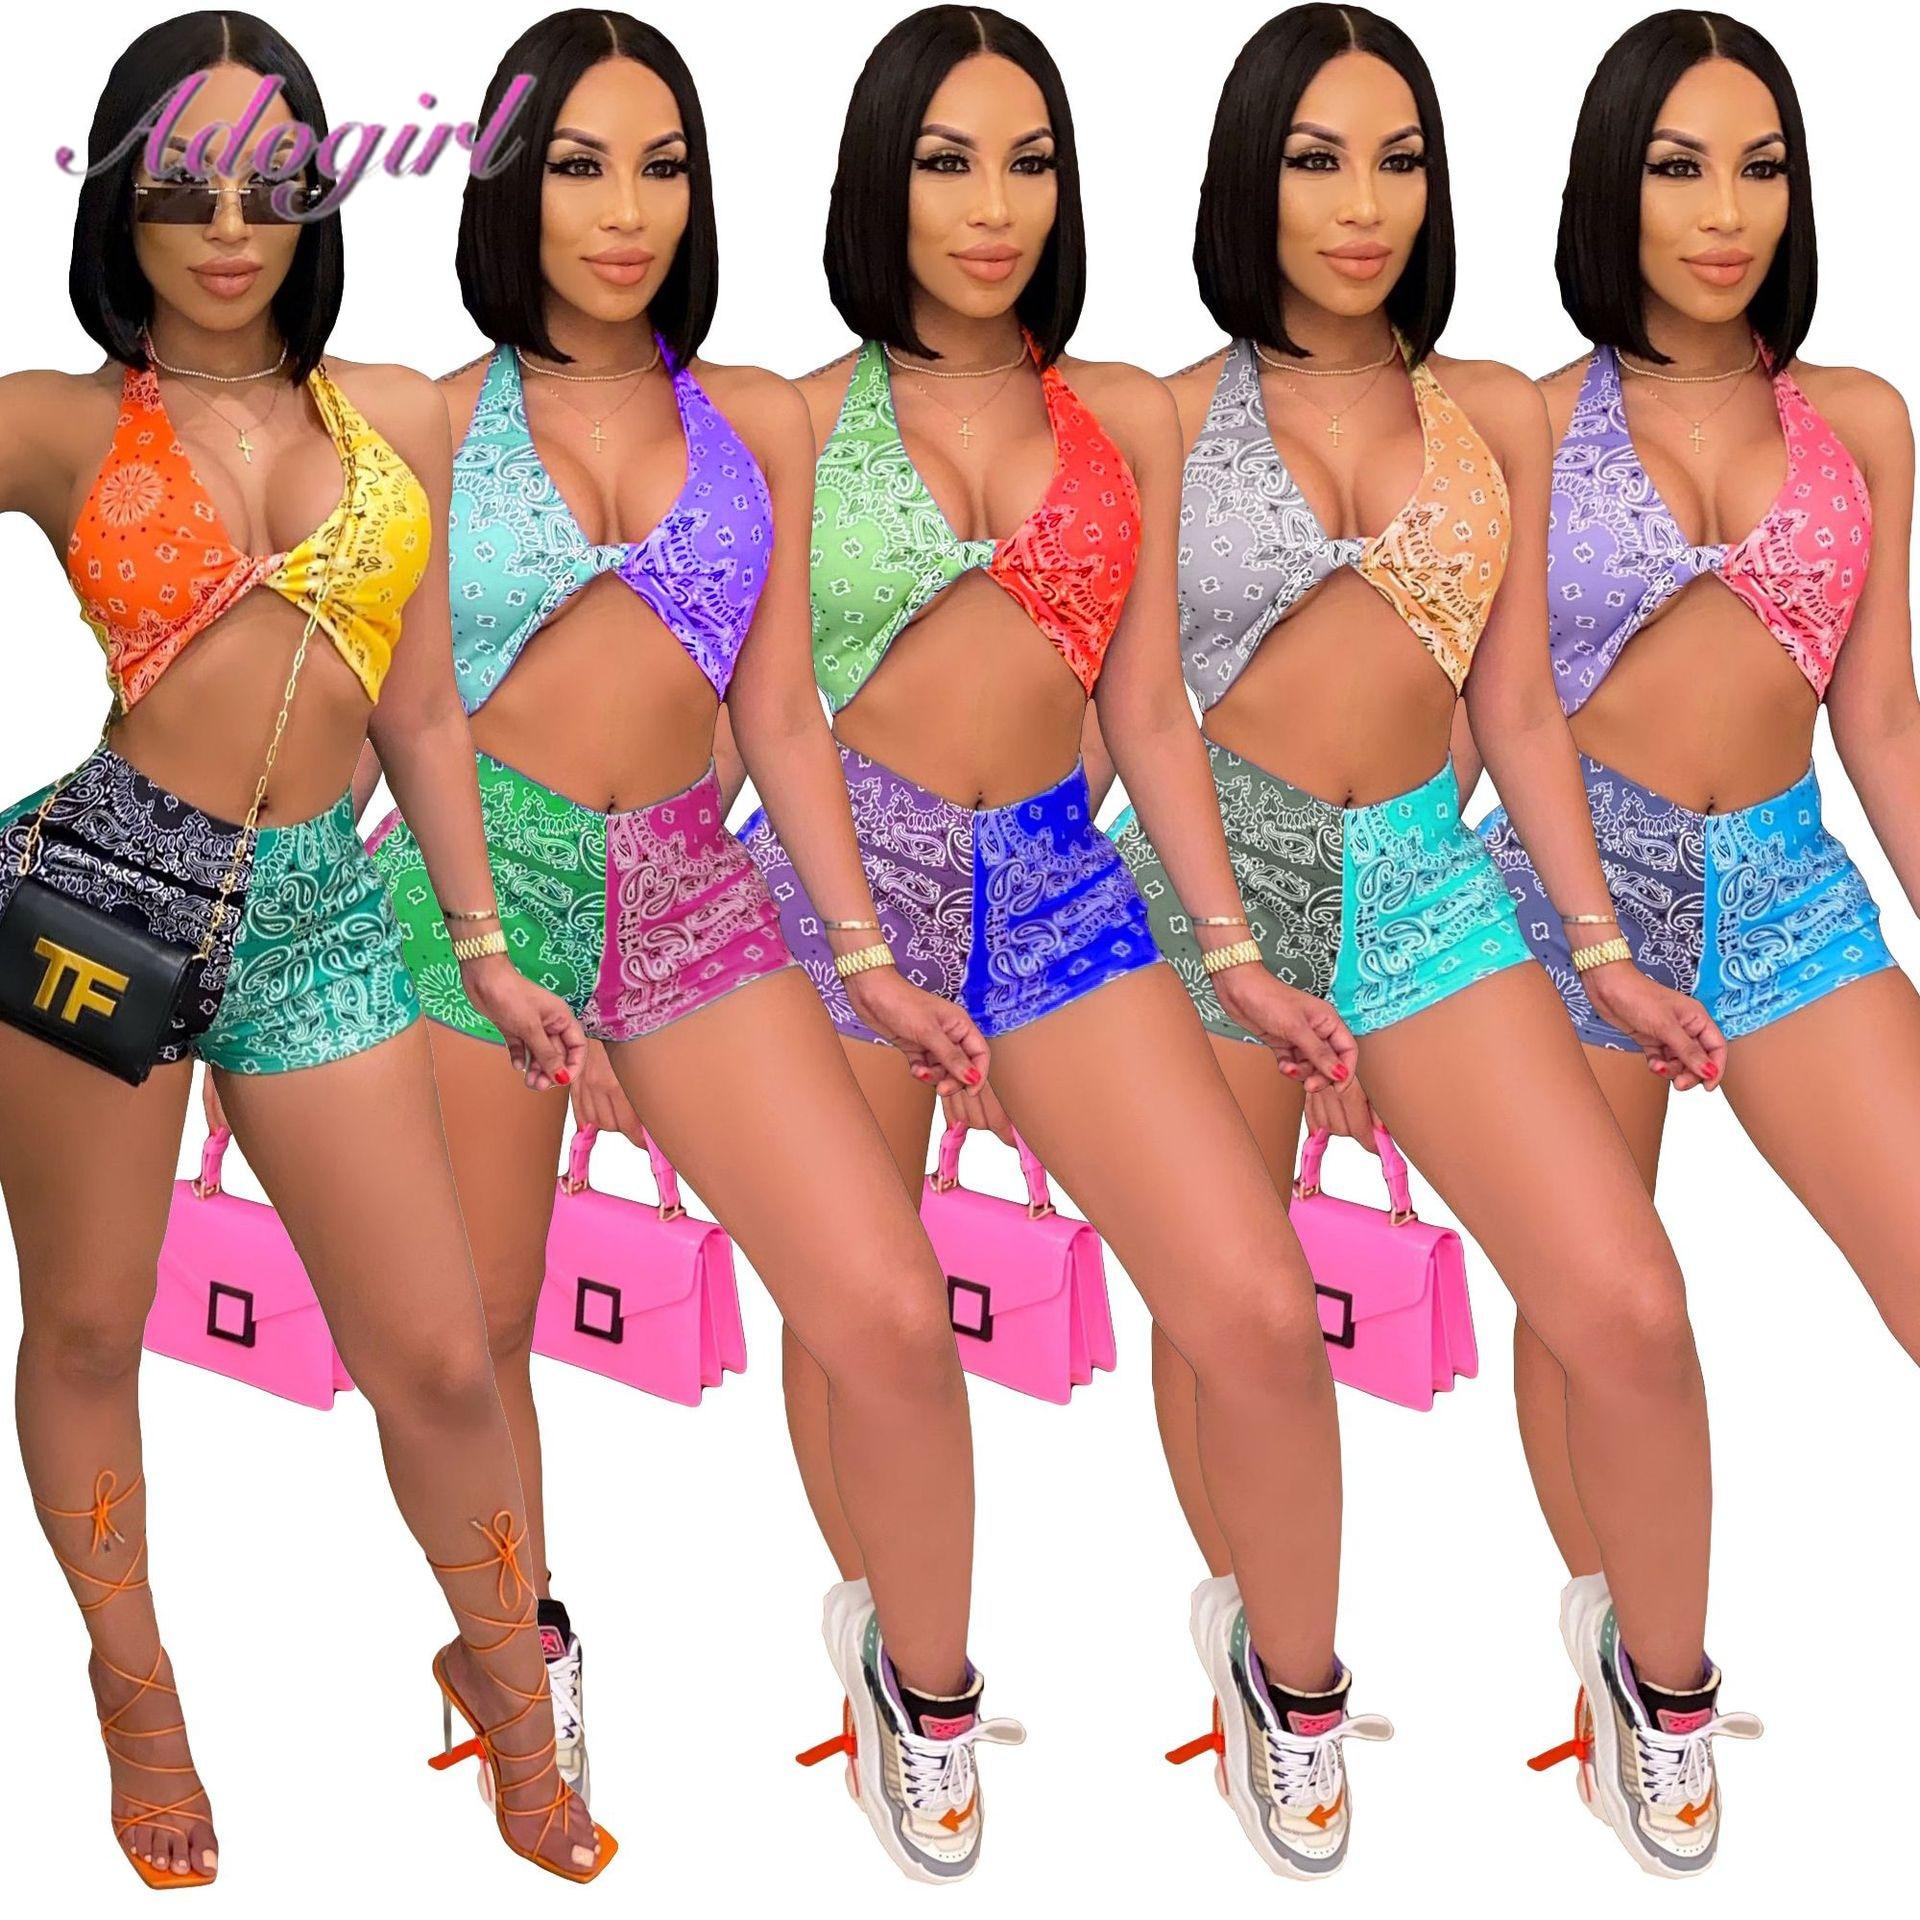 workout-bandana-print-summer-two-piece-sets-women-sexy-halter-bra-crop-top-shorts-outfit-beach-matching-set-sportwear-tracksuit